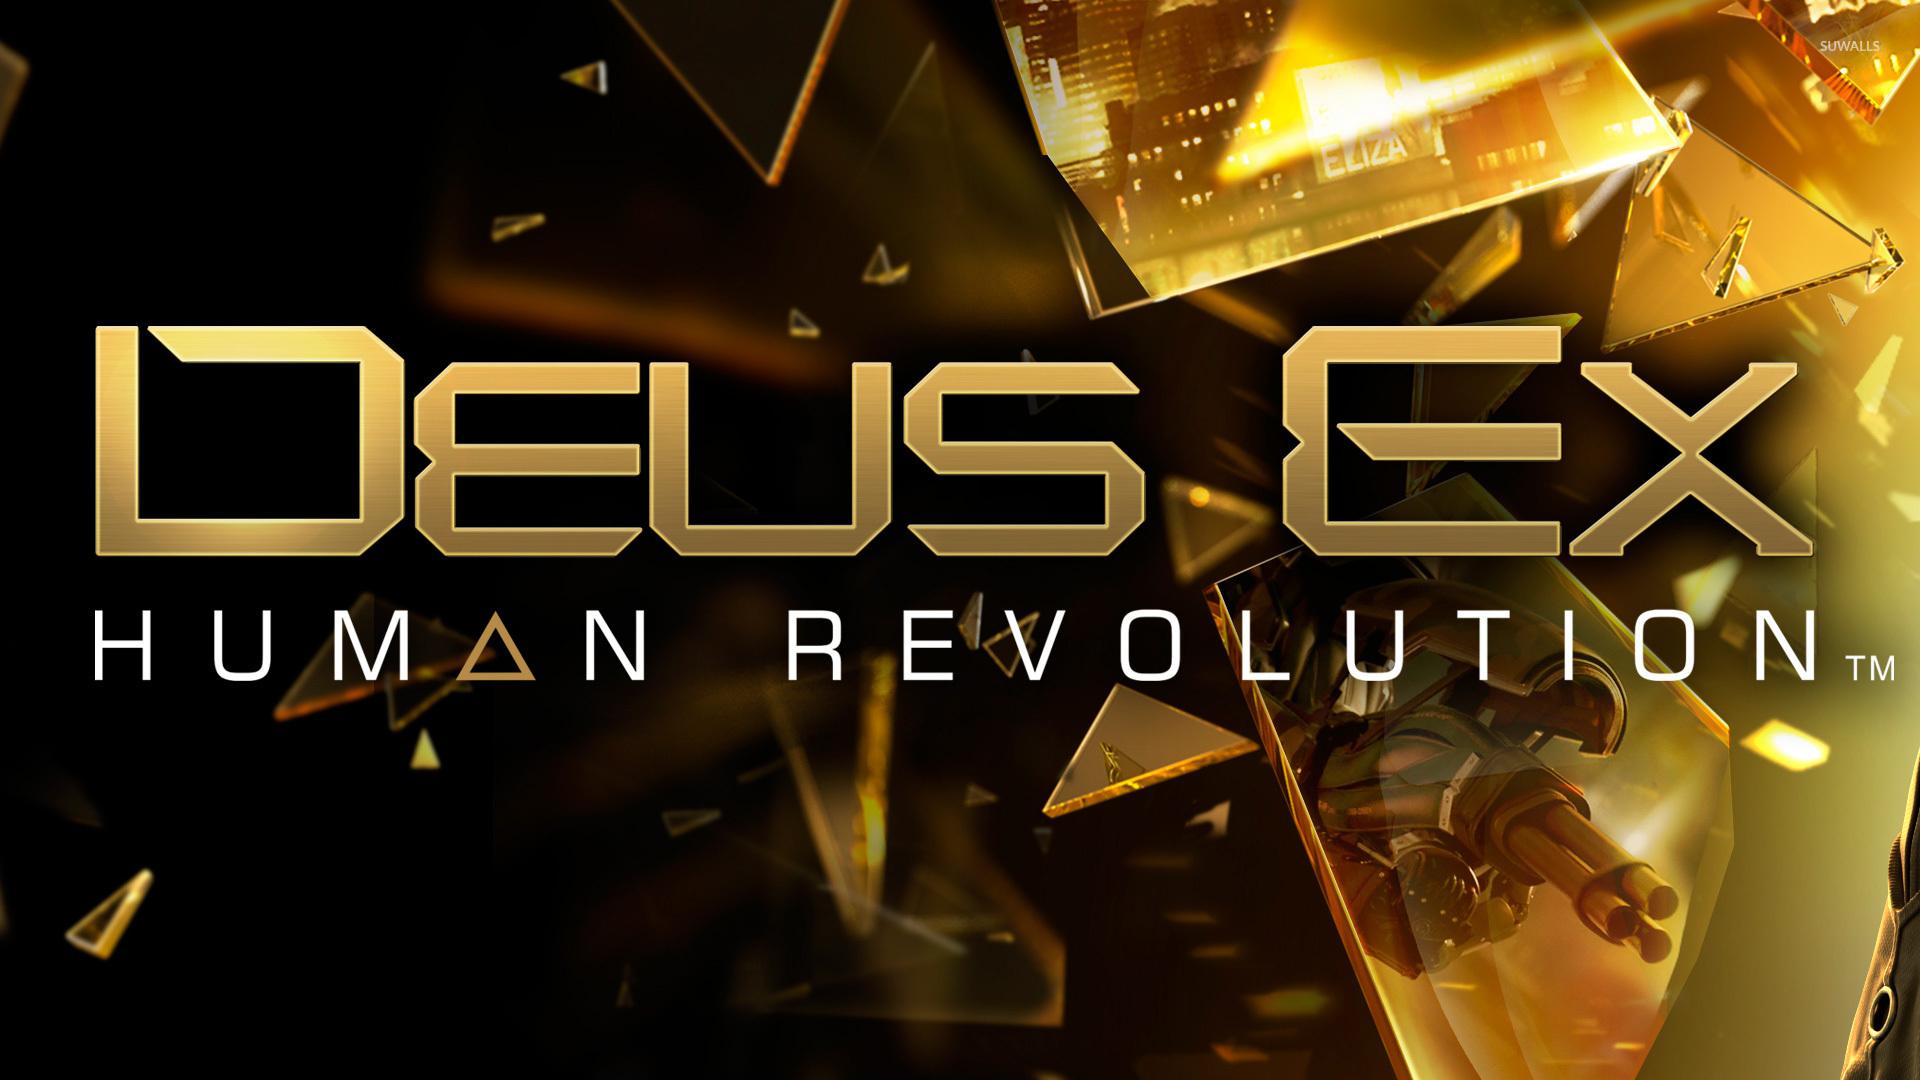 Deus Ex Human Revolution Quotes Wallpaper Deus Ex Human Revolution 4 Wallpaper Game Wallpapers